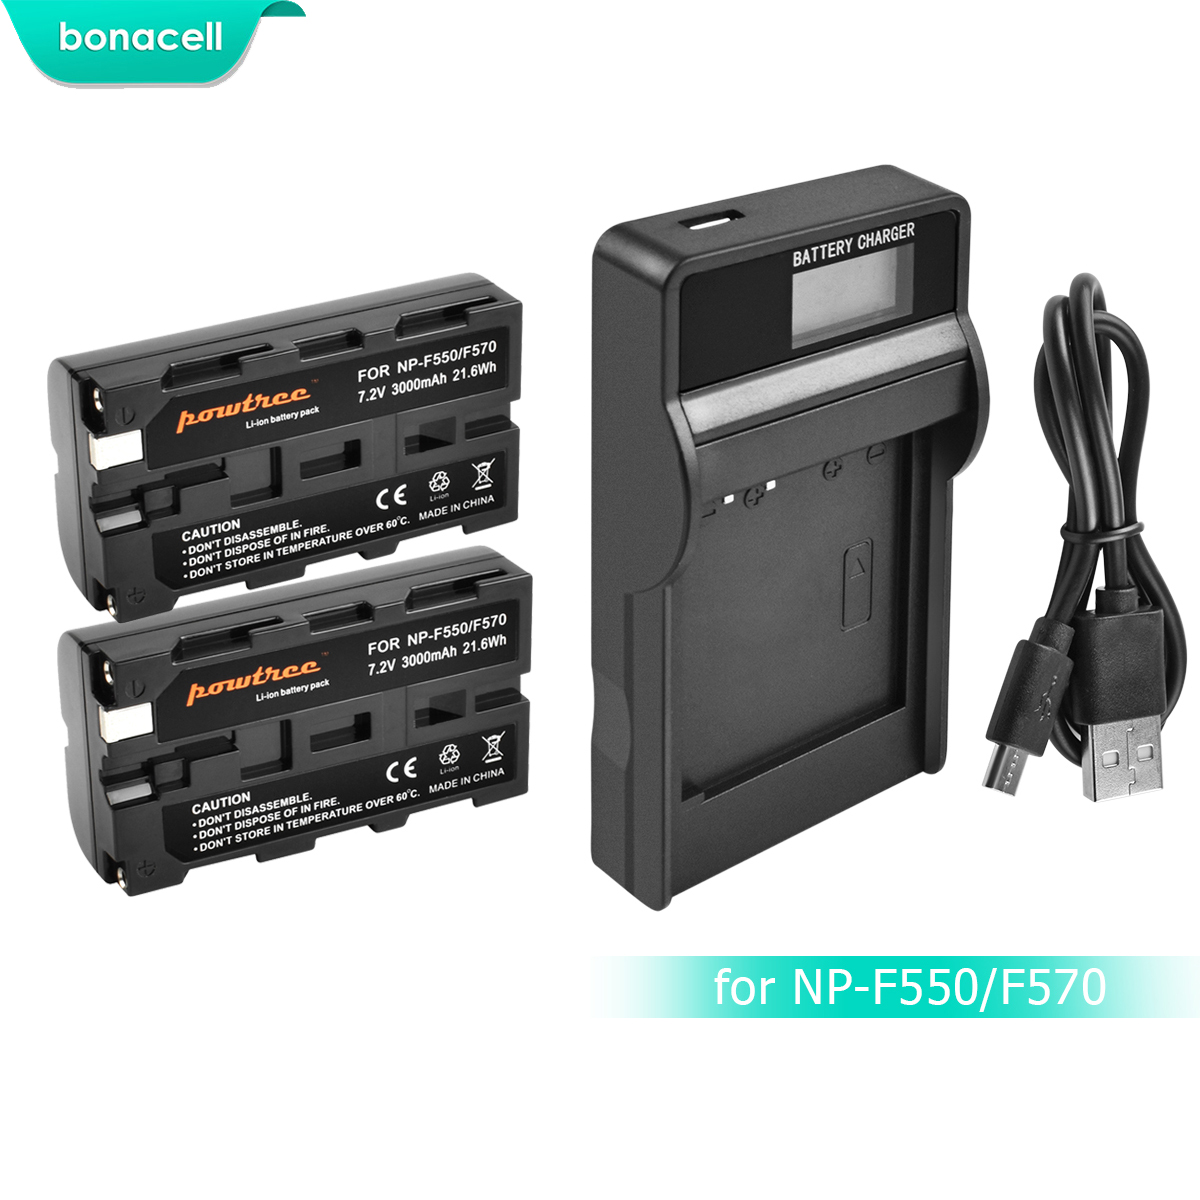 Bonacell 3000mAh NP-F550 NP F550 NPF550 Battery+LCD Charger For Sony NP-F330 NP-F530 NP-F570 NP-F730 NP-F750 Hi-8 GV-D200 L10